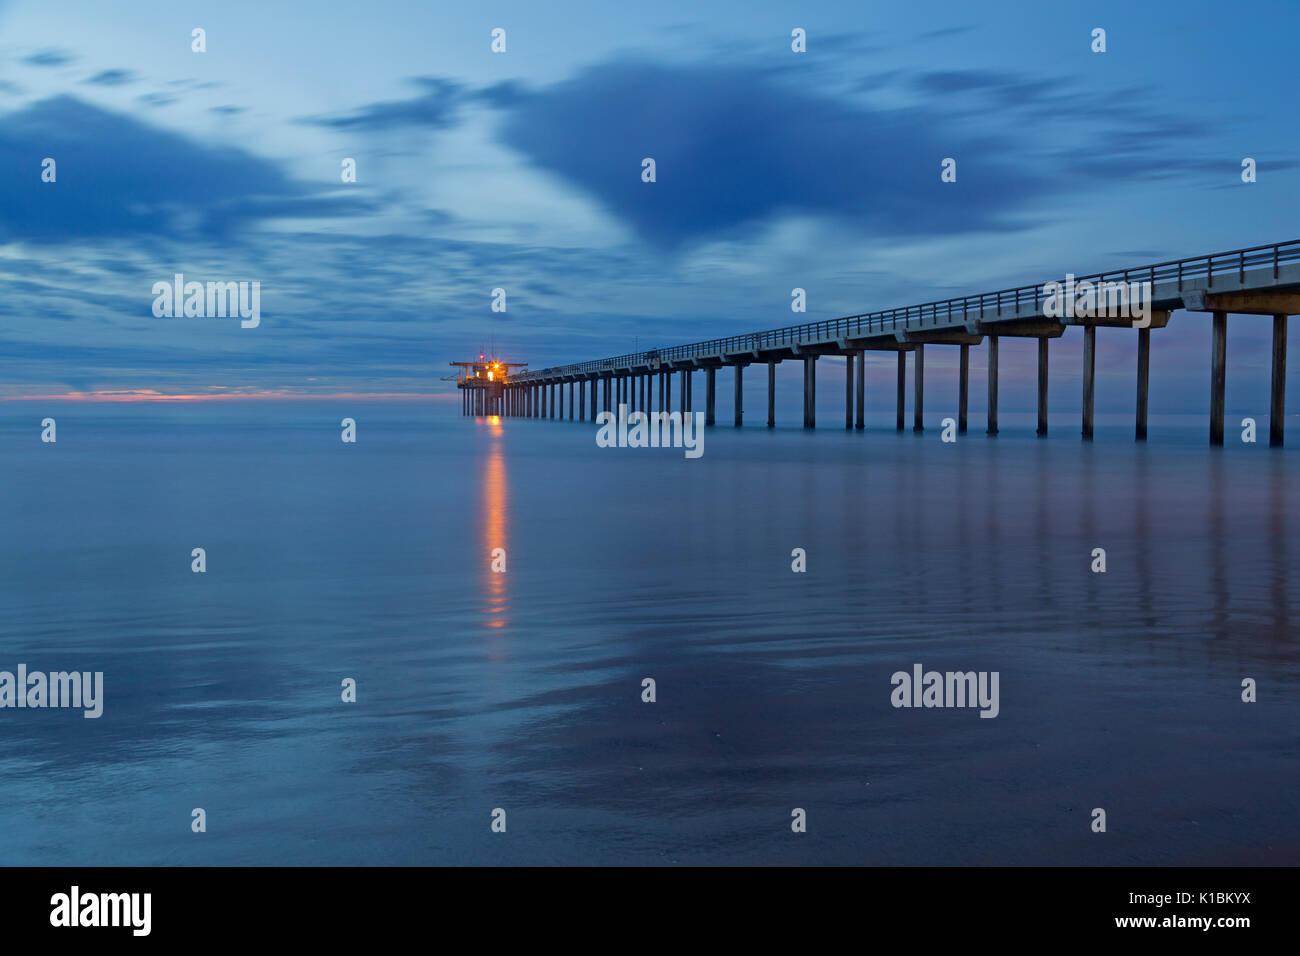 Scripps Pier at sunset, La Jolla, California - Stock Image